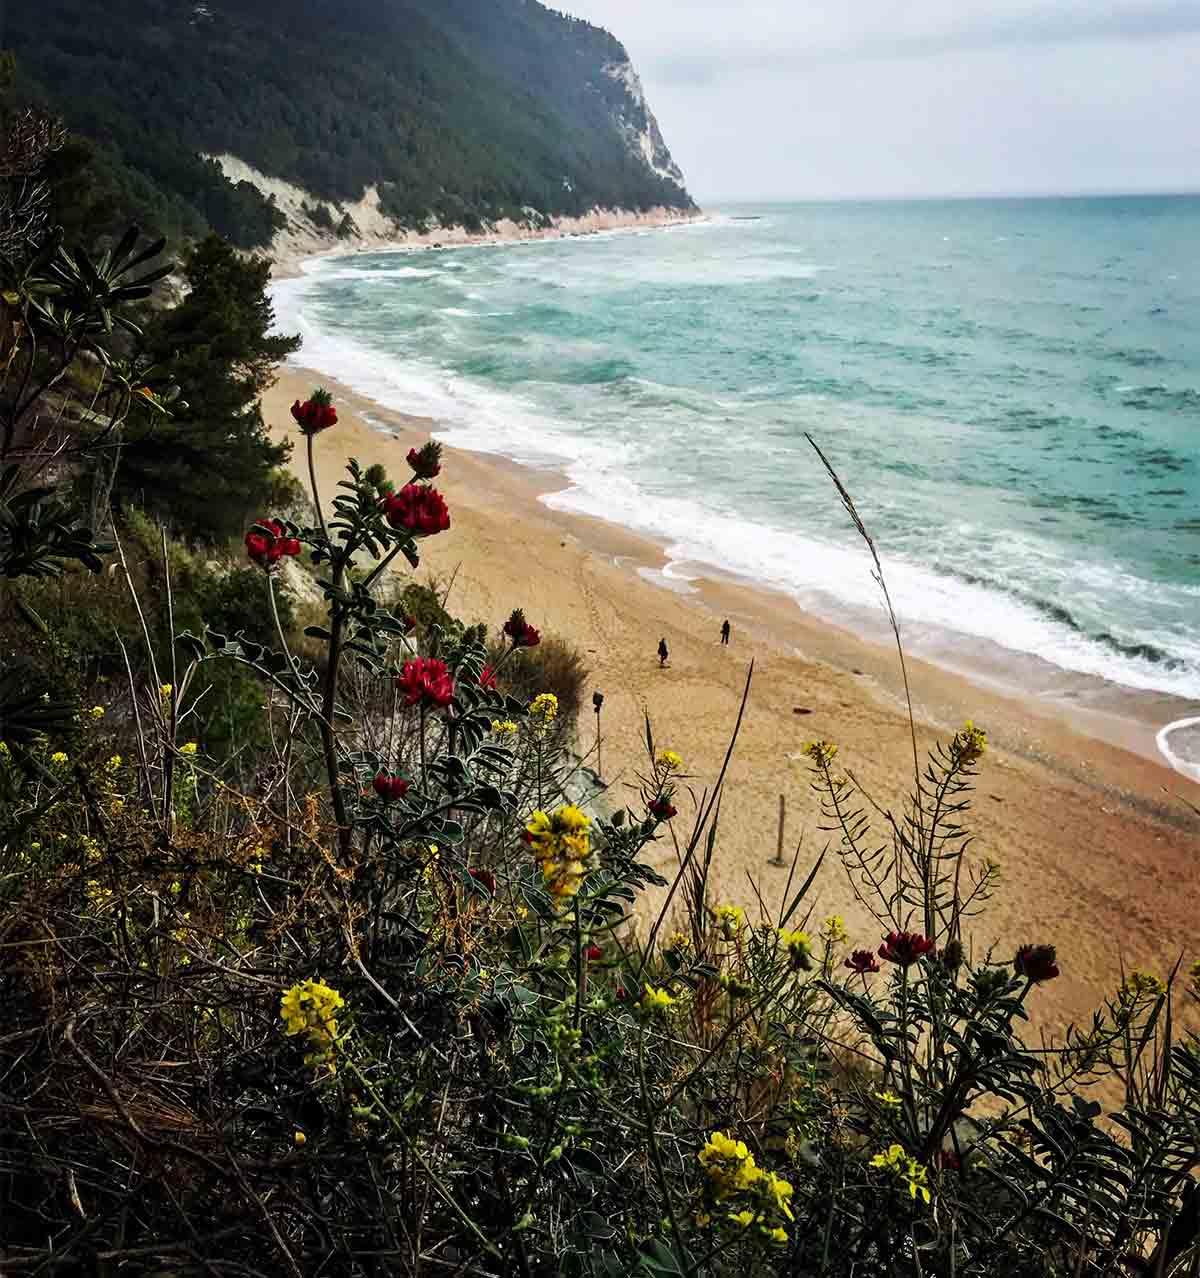 Sirolo, Spiaggia San Michele